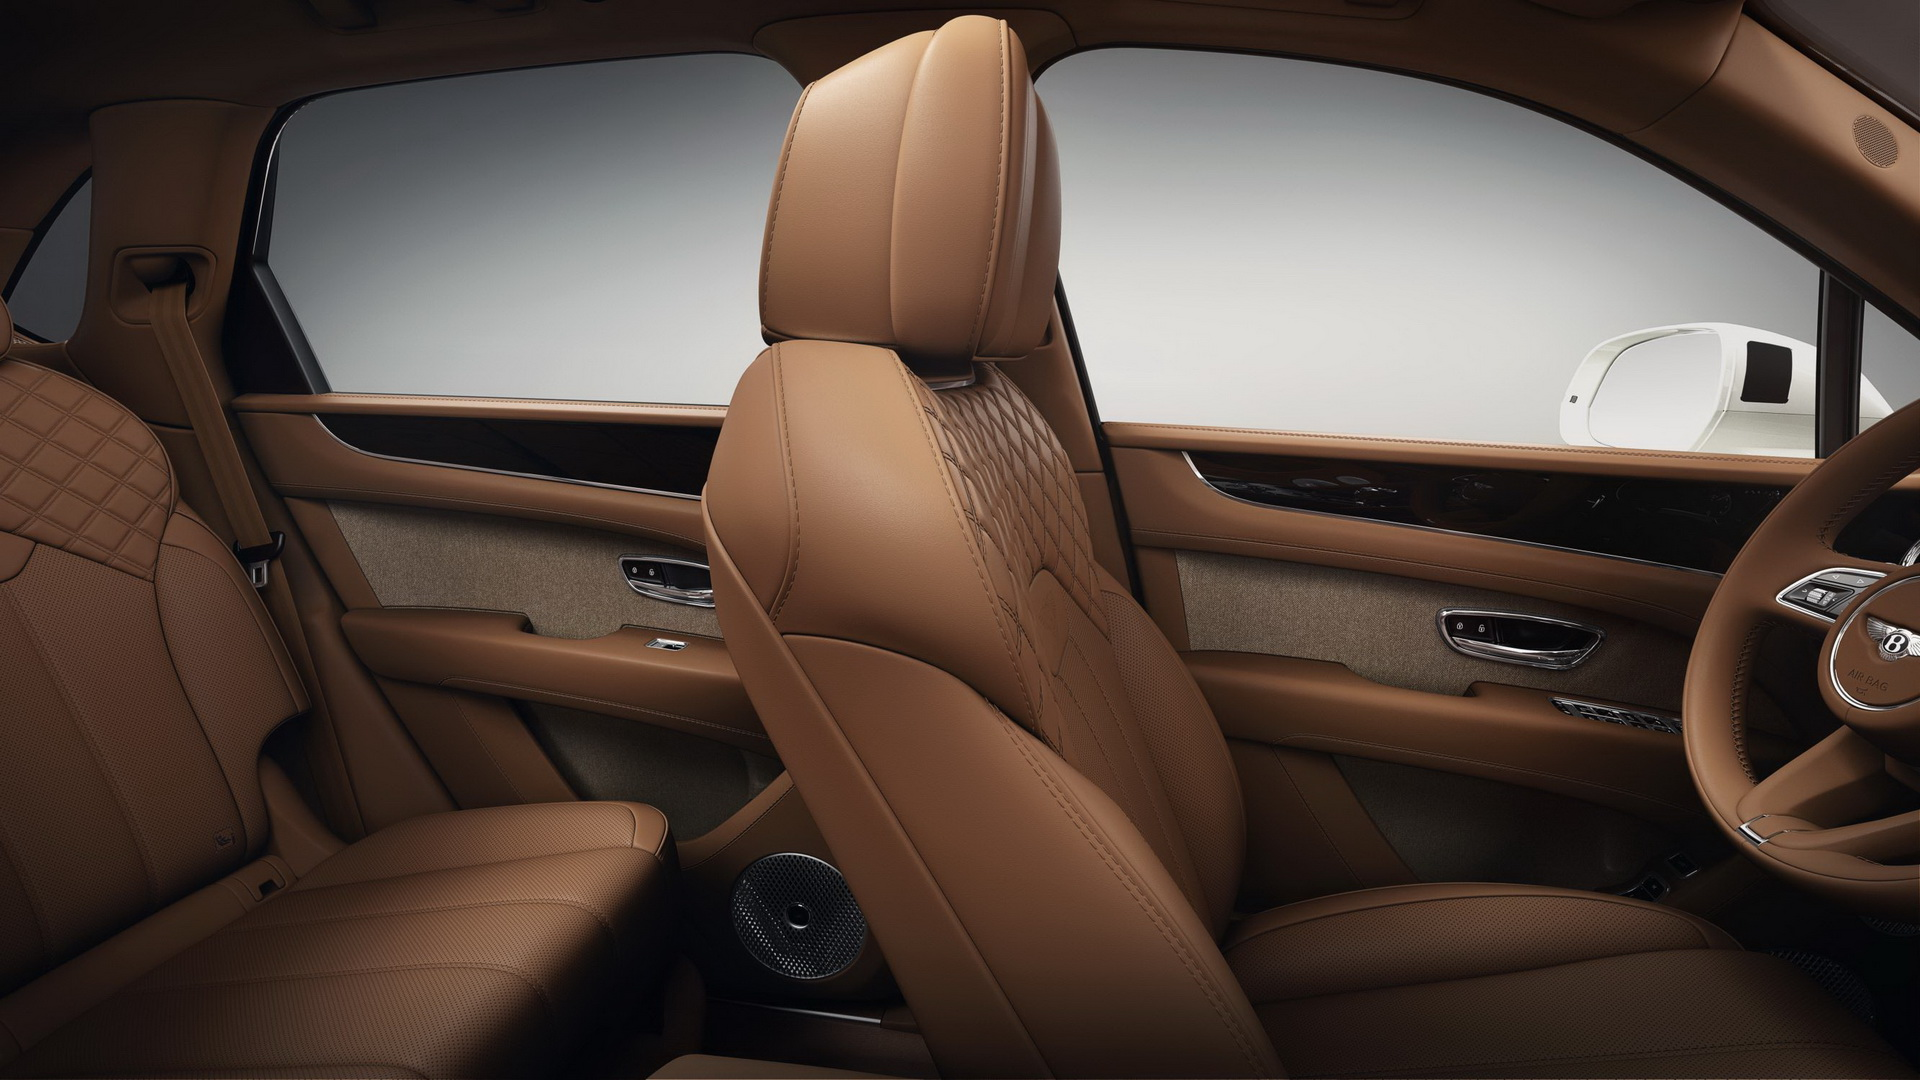 bentley-tweed-interior-option-for-all-models-6